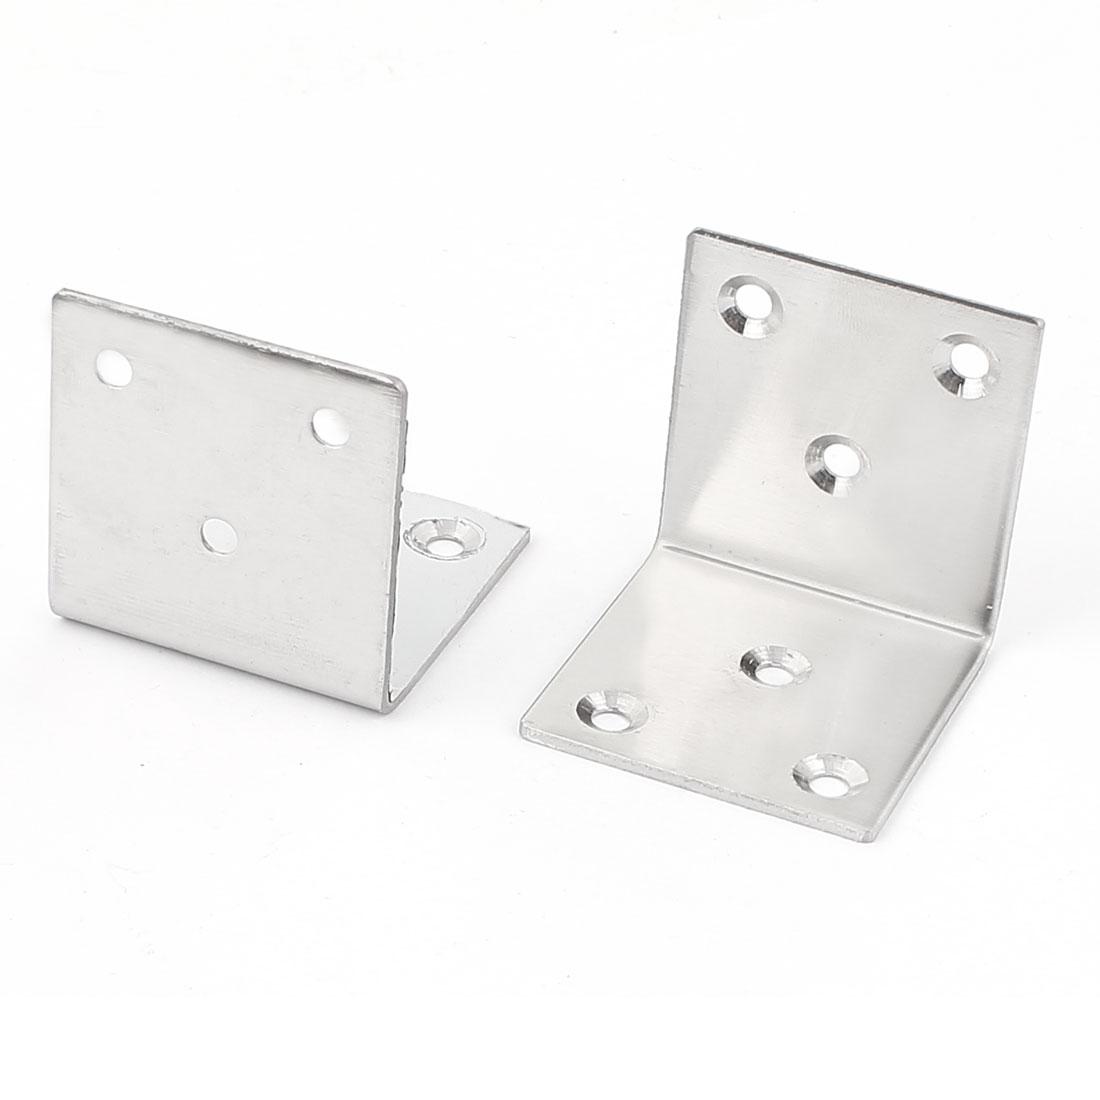 52mmx52mmx49mm Shelf Support Corner Brace Joint Metal Right Angle Bracket 2Pcs